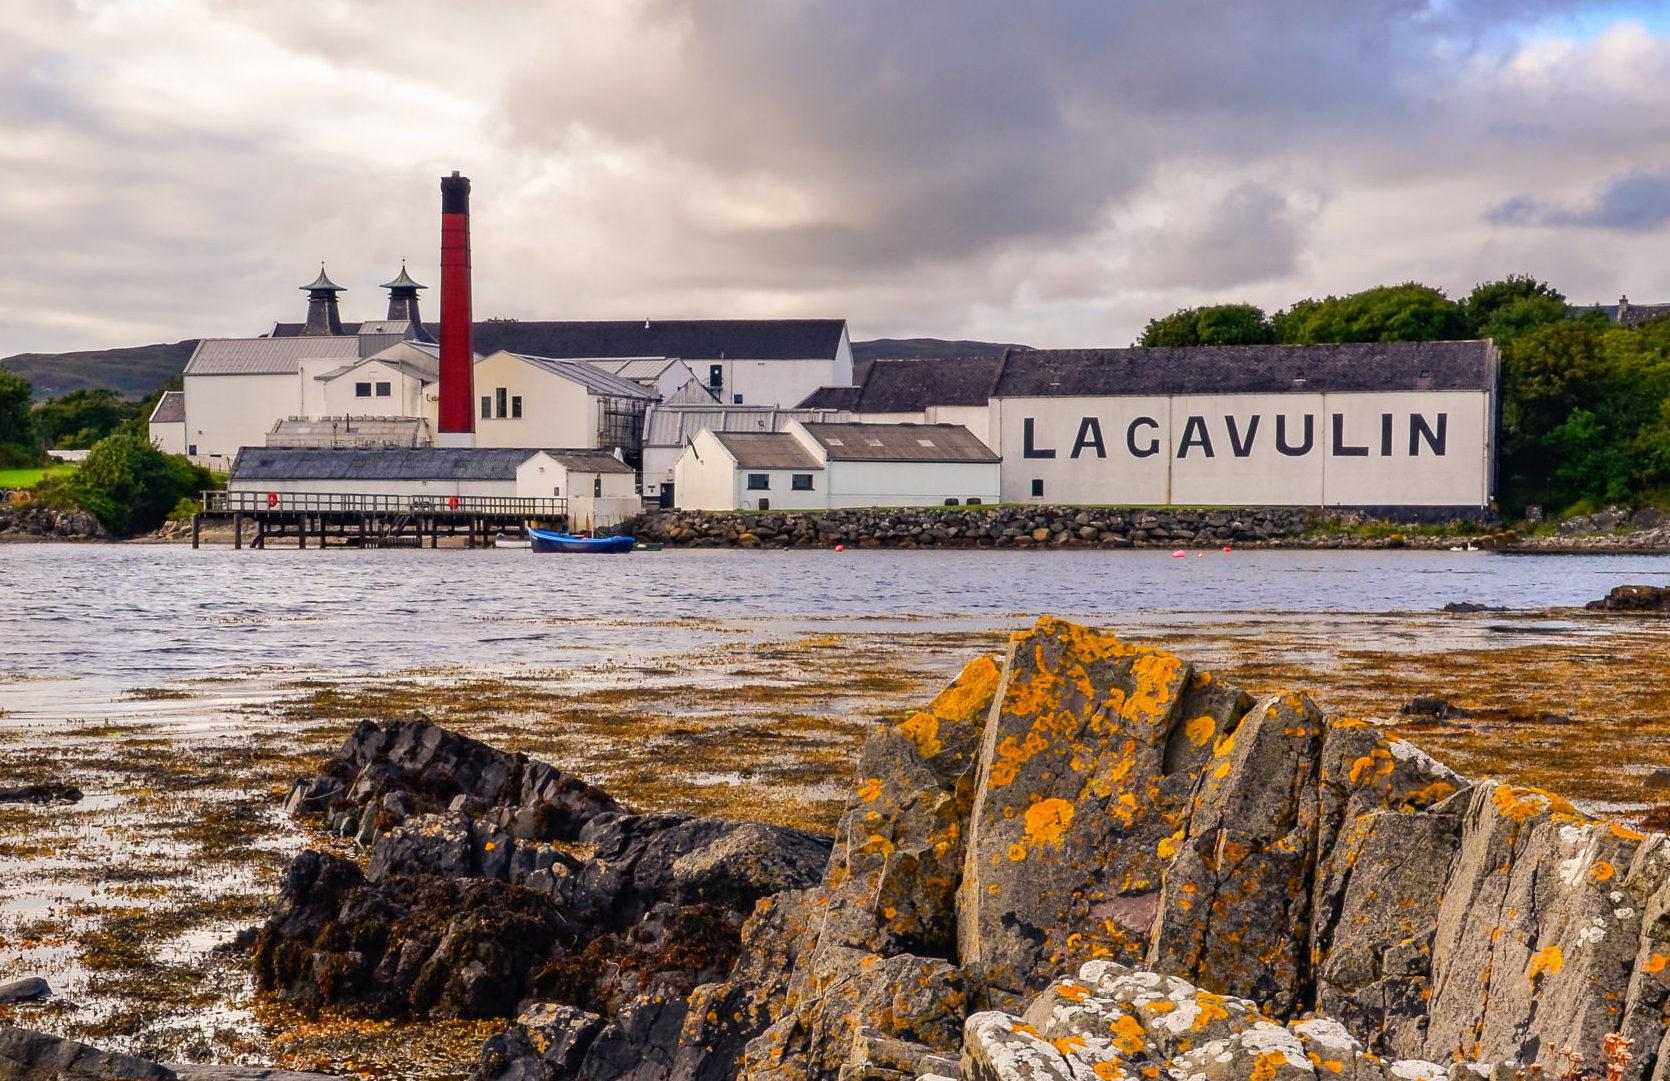 Lagavulin in Port Ellen, Islay